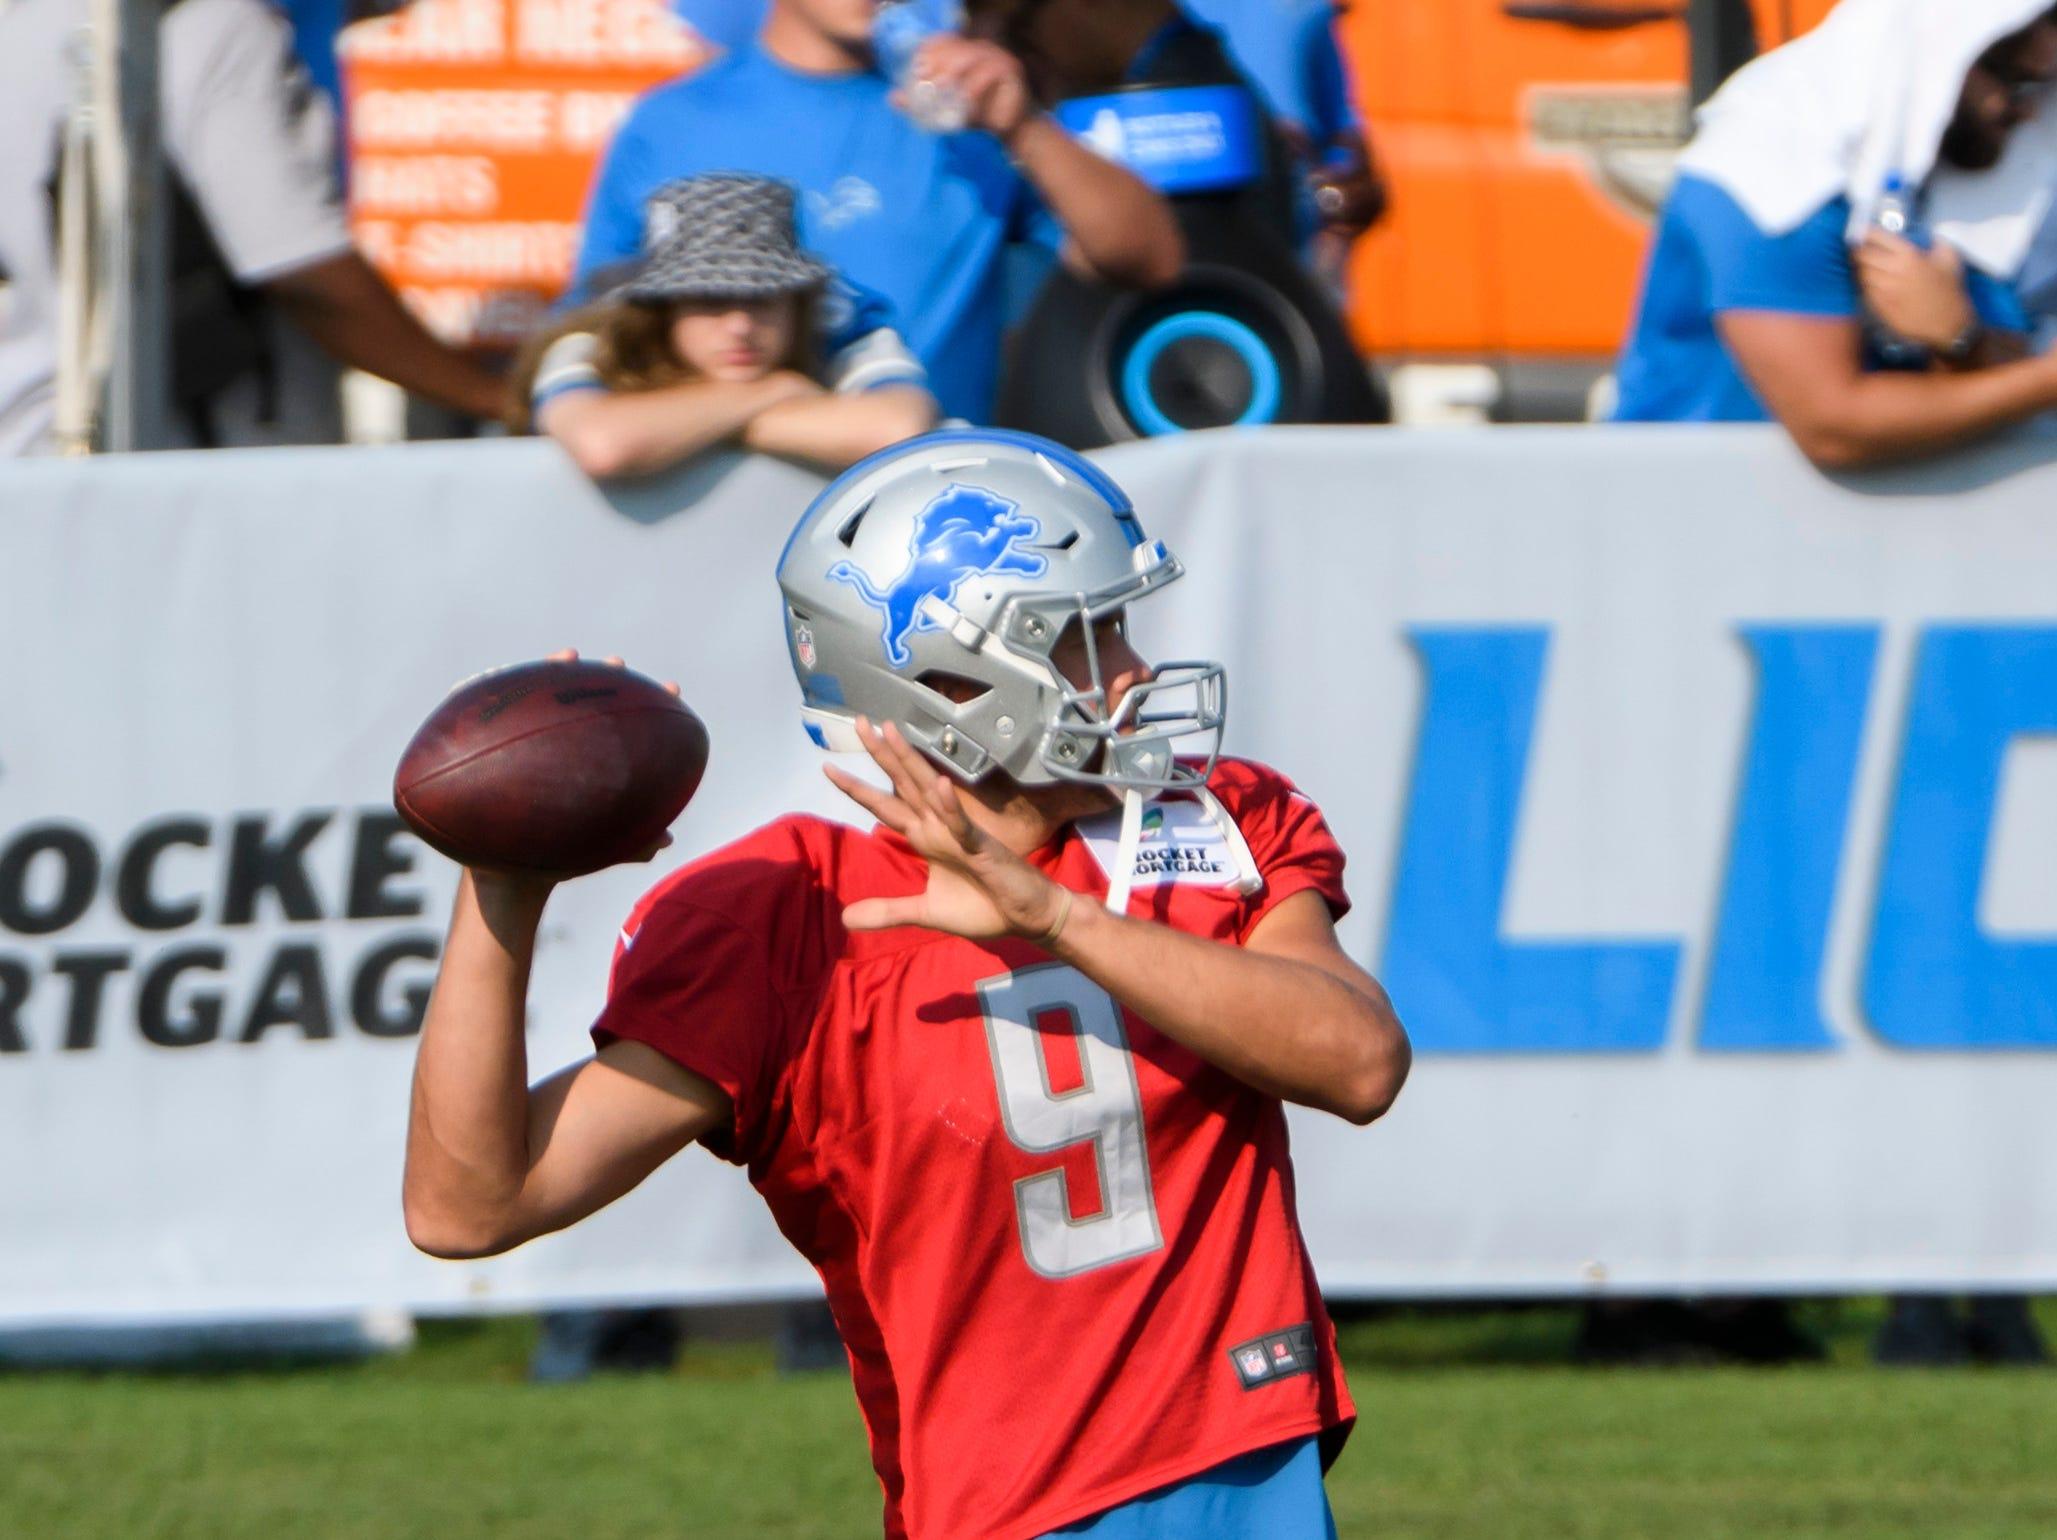 Lions quarterback Matthew Stafford throws a pass during warmups.